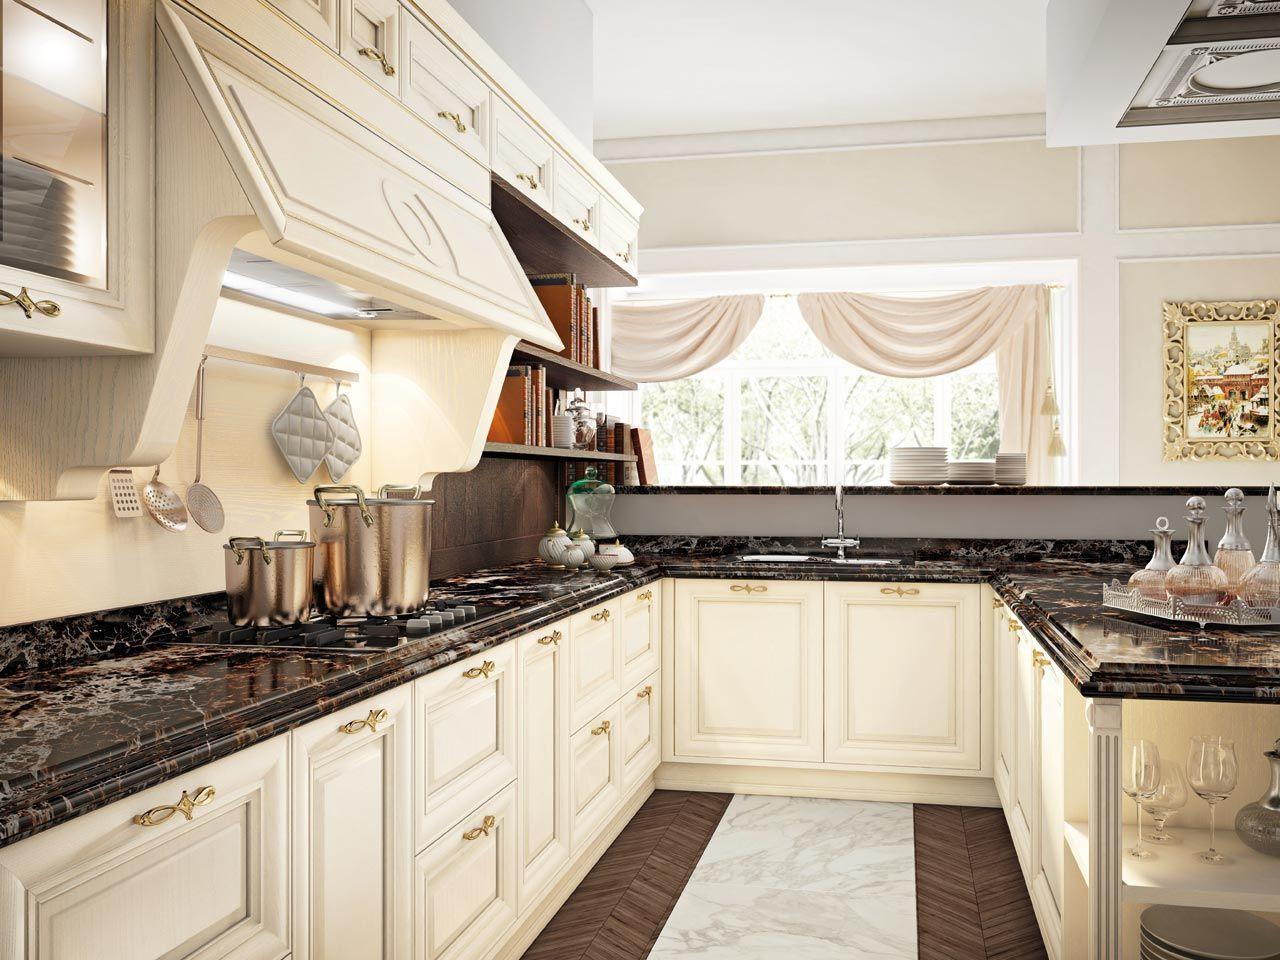 Cucina Mobili Cucina E Complementi Cucine #B44F13 1280 960 Virtual Planner Cucina Mondo Convenienza